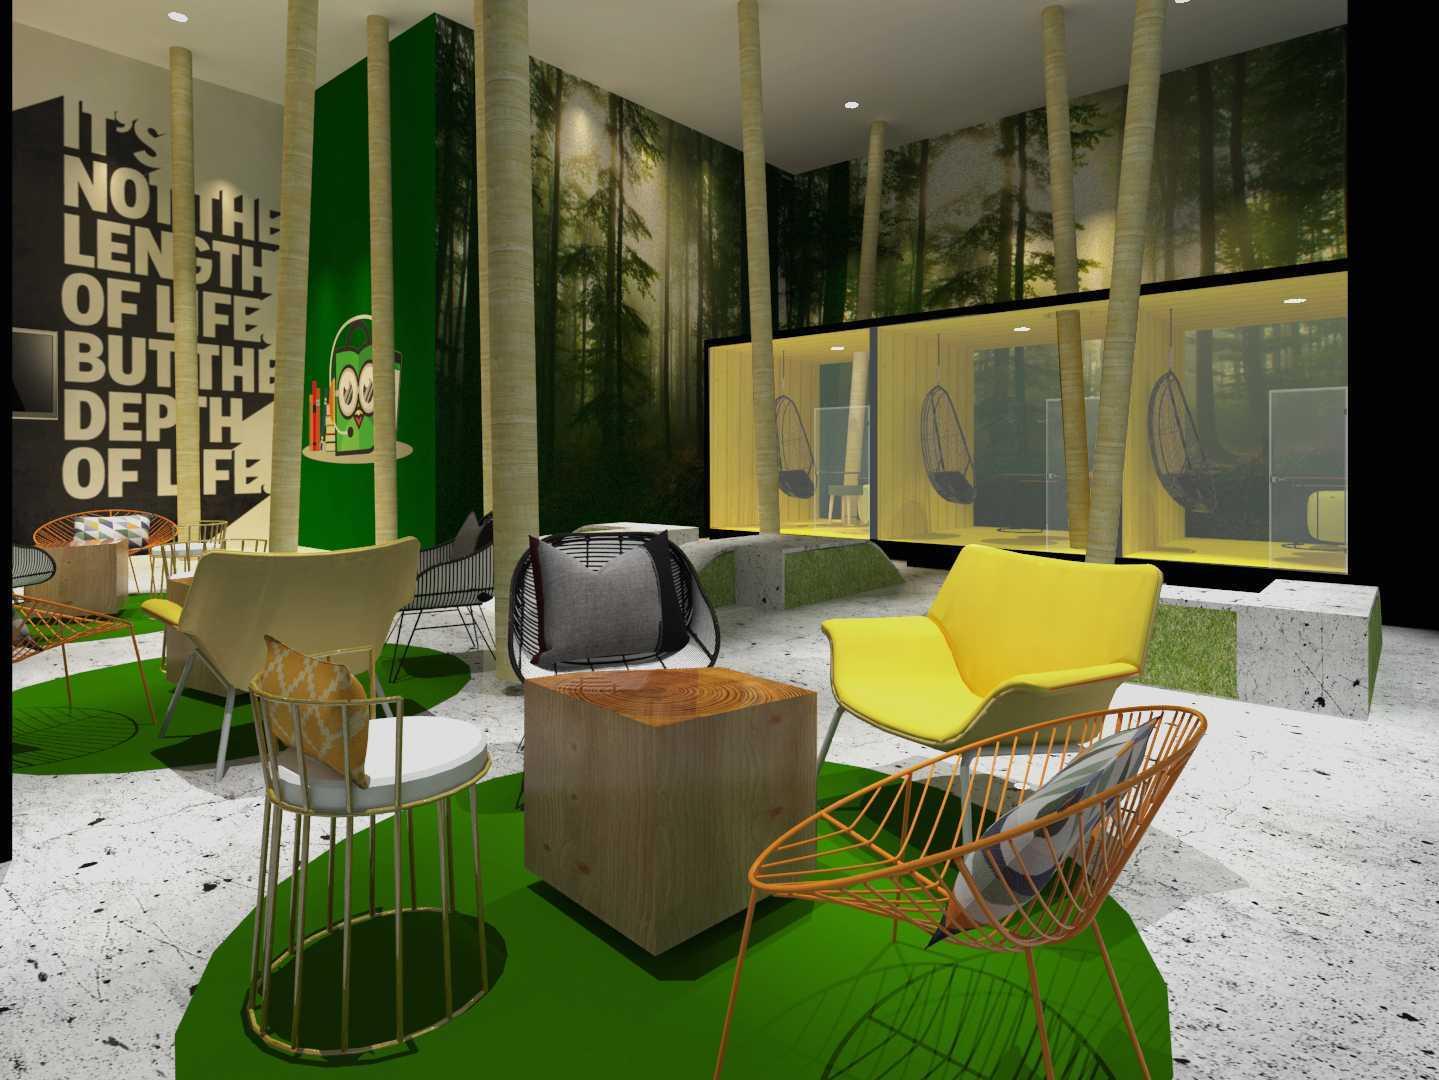 Tms Creative Tokopedia Care Office Jl. Lkr. Luar Bar., Kota Jakarta Barat, Daerah Khusus Ibukota Jakarta, Indonesia  Tms-Creative-Tokopedia-Care-Office Modern  56639